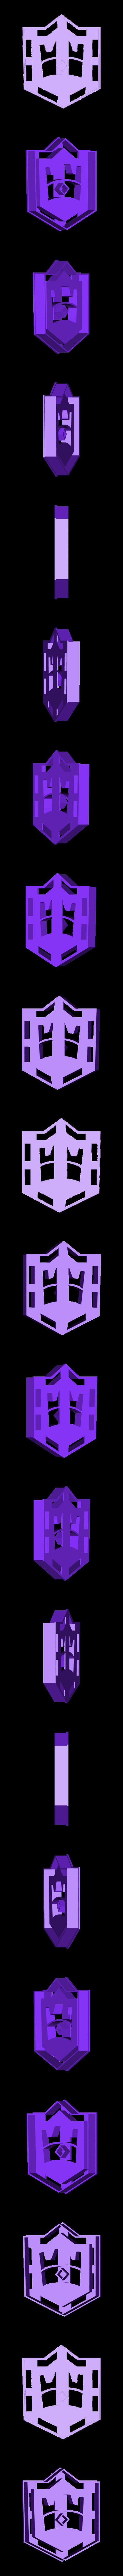 clash cookie.stl Download STL file cookie cutter cookie cutter clash royale • Design to 3D print, PatricioVazquez